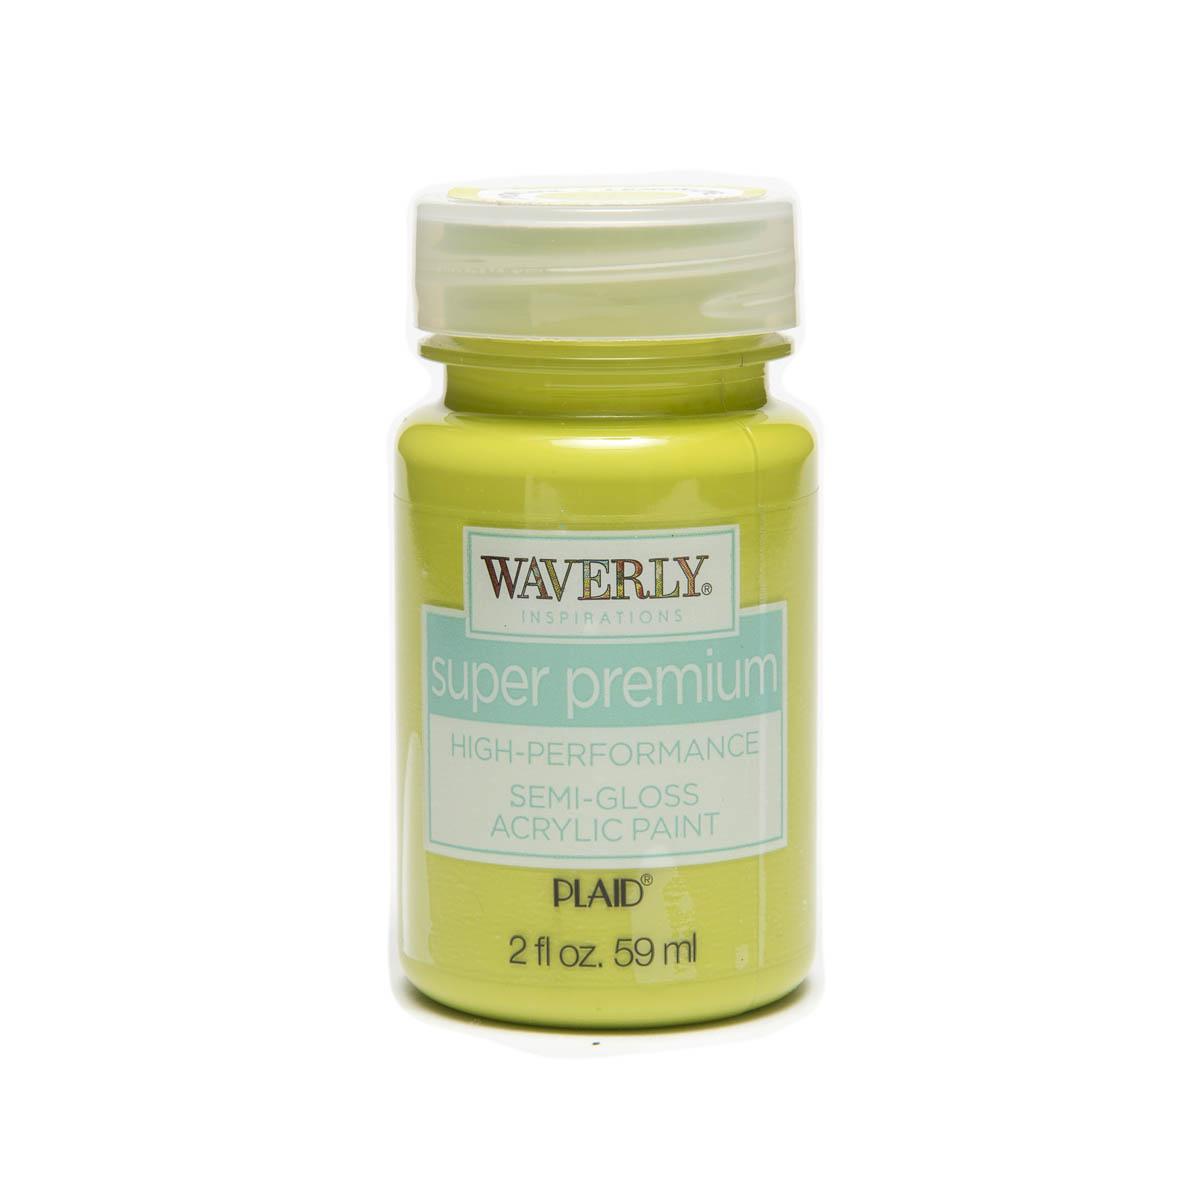 Waverly ® Inspirations Super Premium Semi-Gloss Acrylic Paint - Lemon Lime, 2 oz.